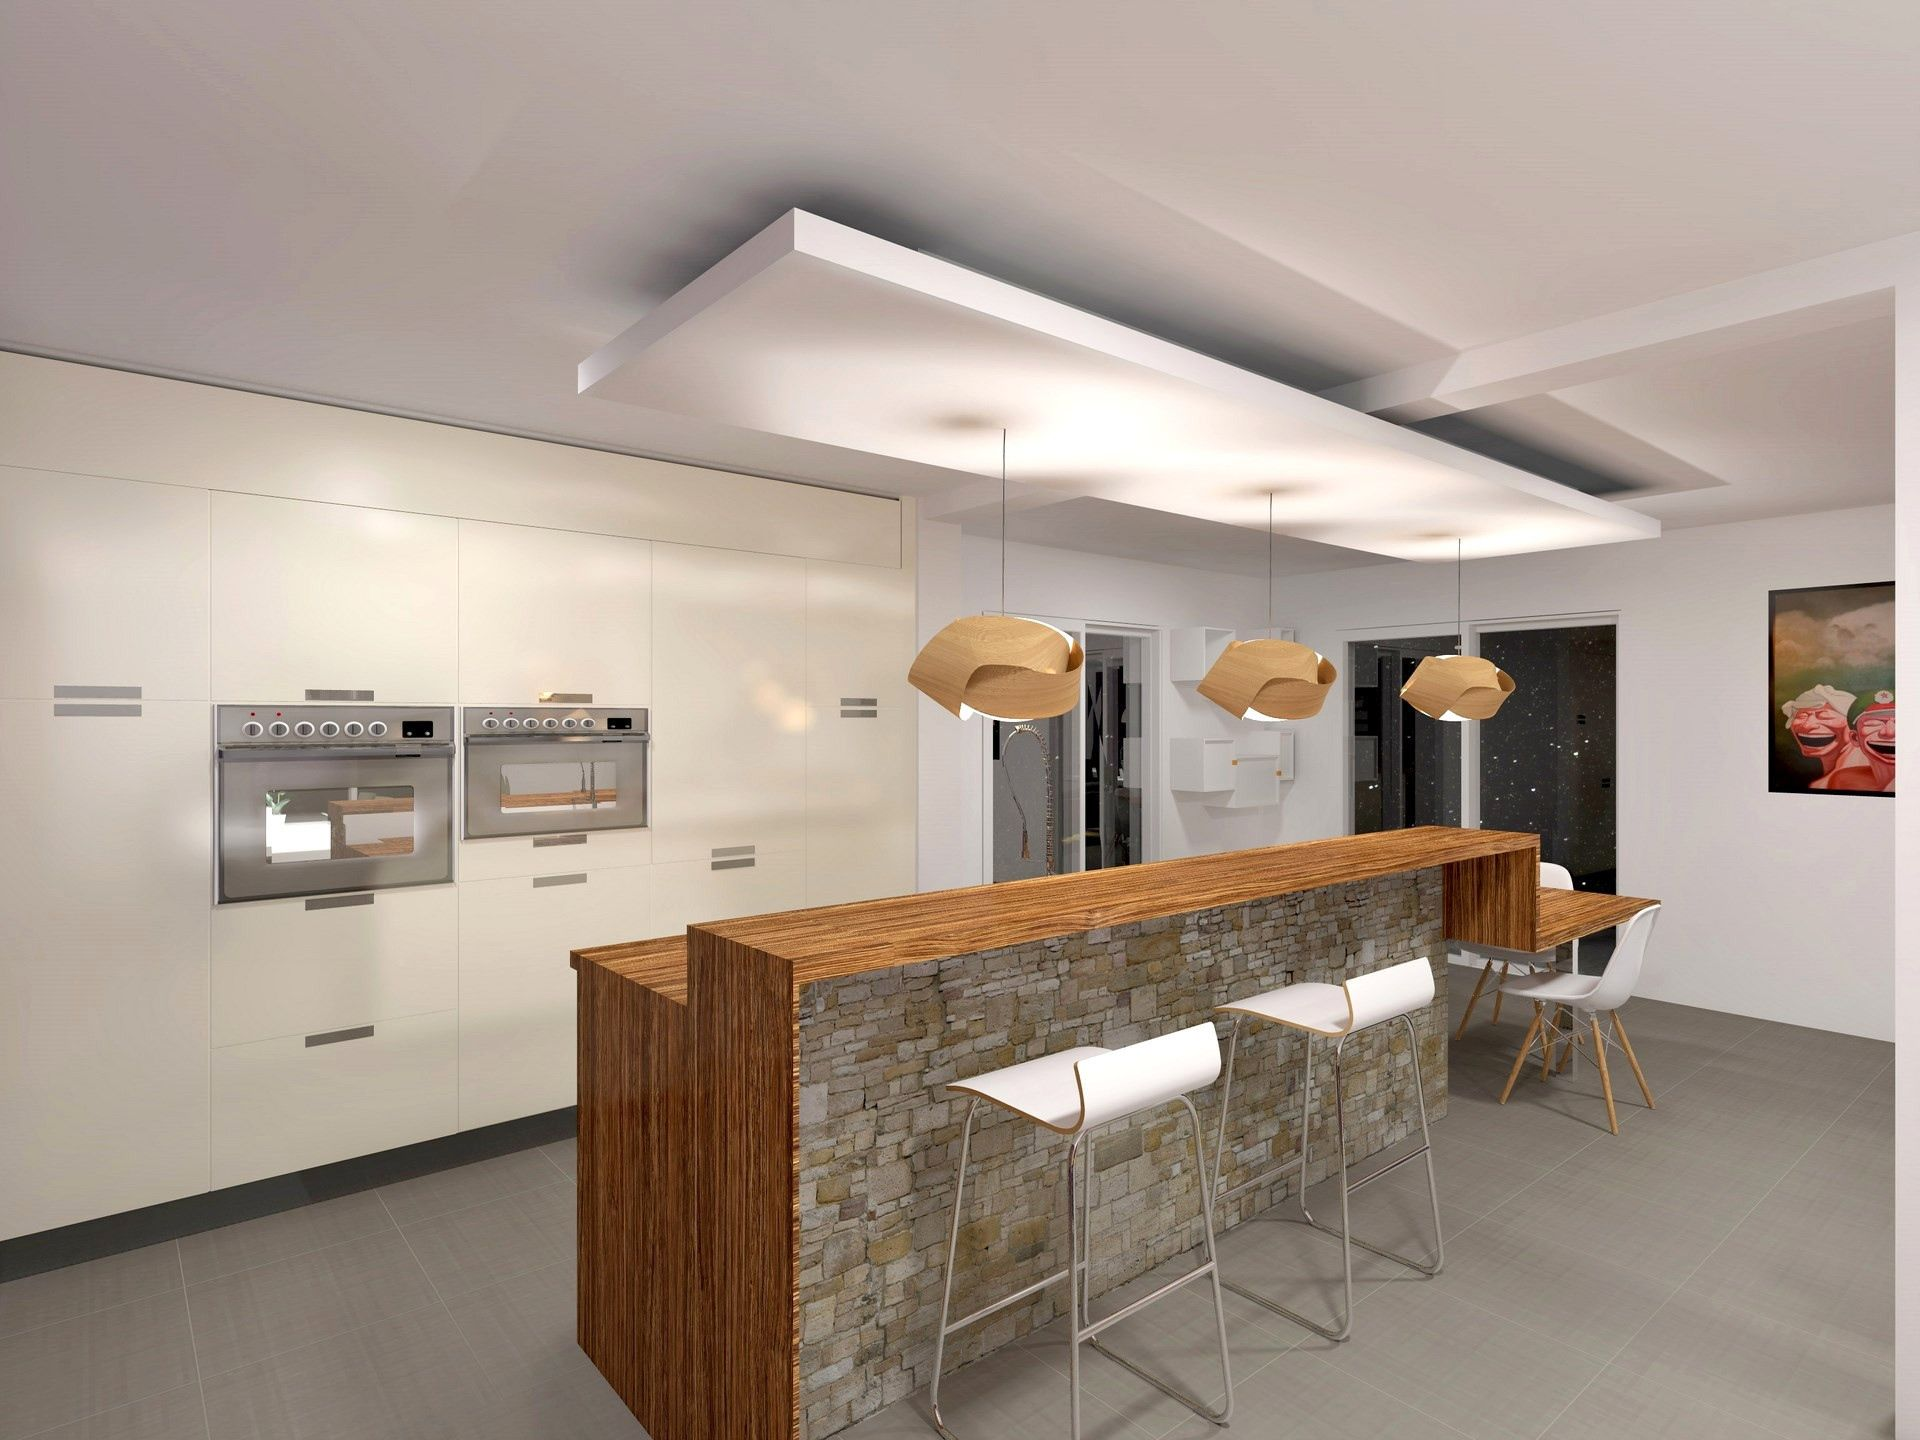 29+ Faux plafond cuisine design ideas in 2021